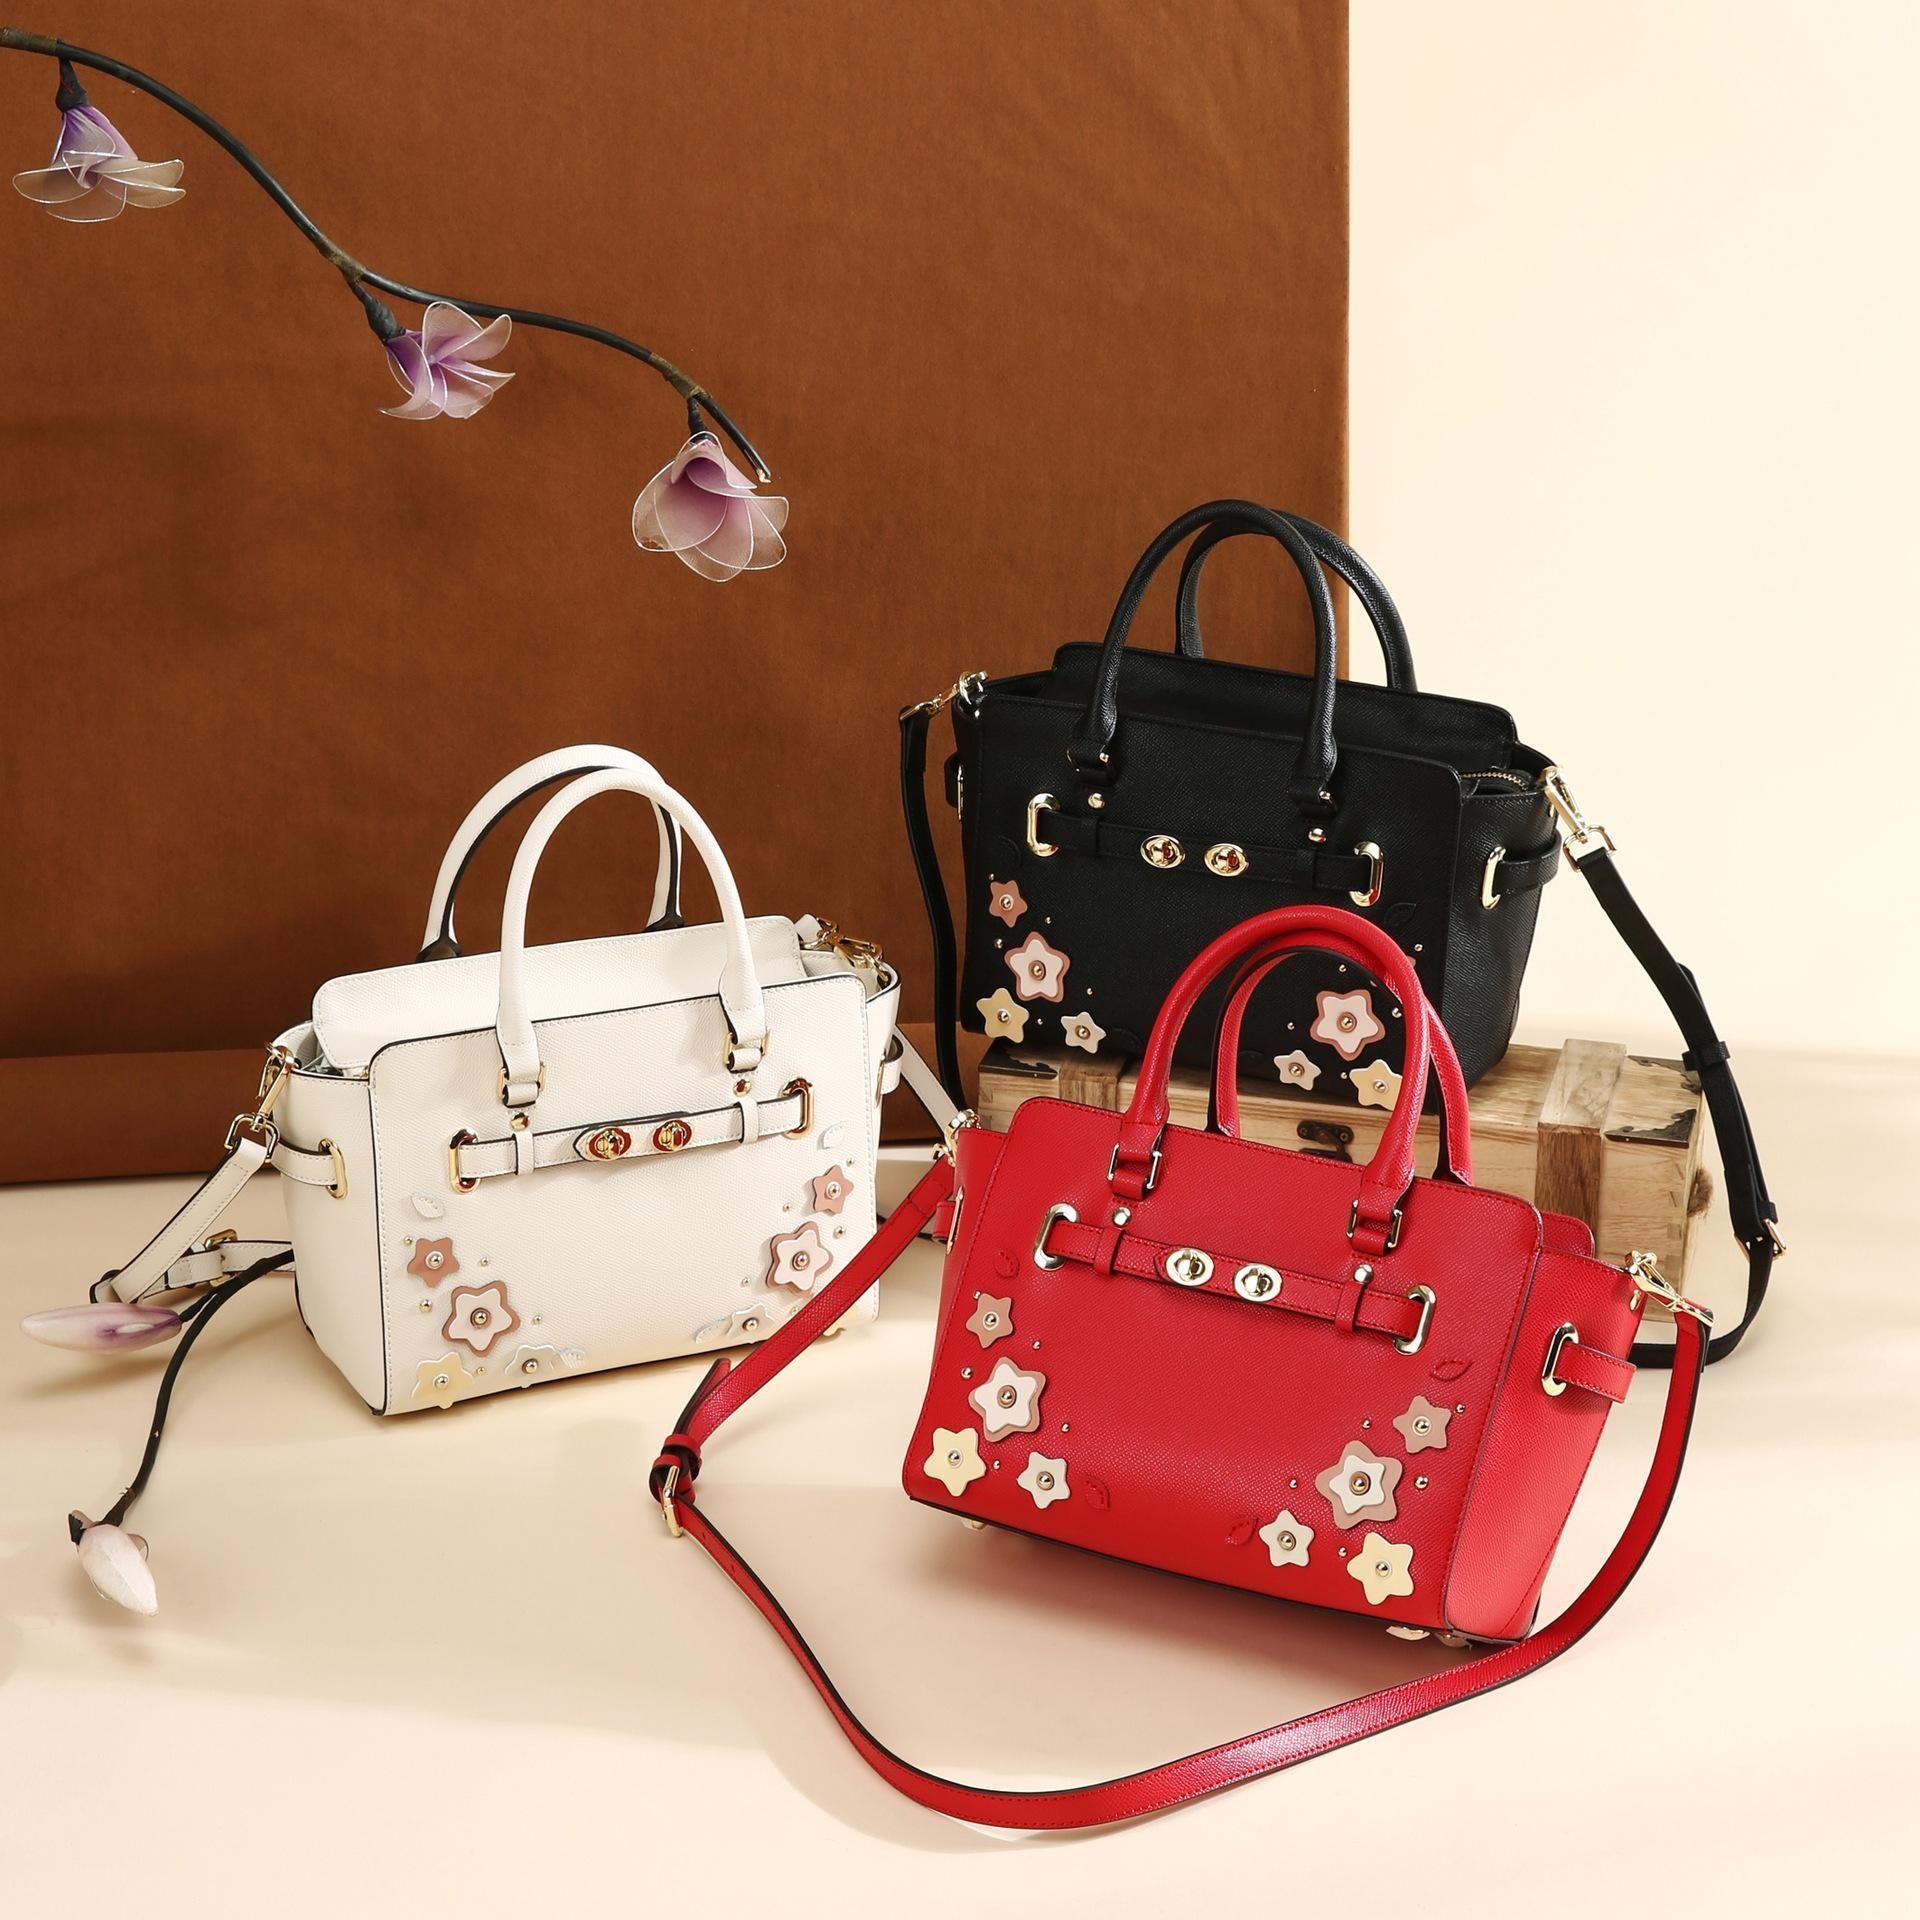 Belle2019 Woman Bag Genuine Leather Hard Hold Wing Ma'am Handbag Messenger All-match Single Shoulder Package